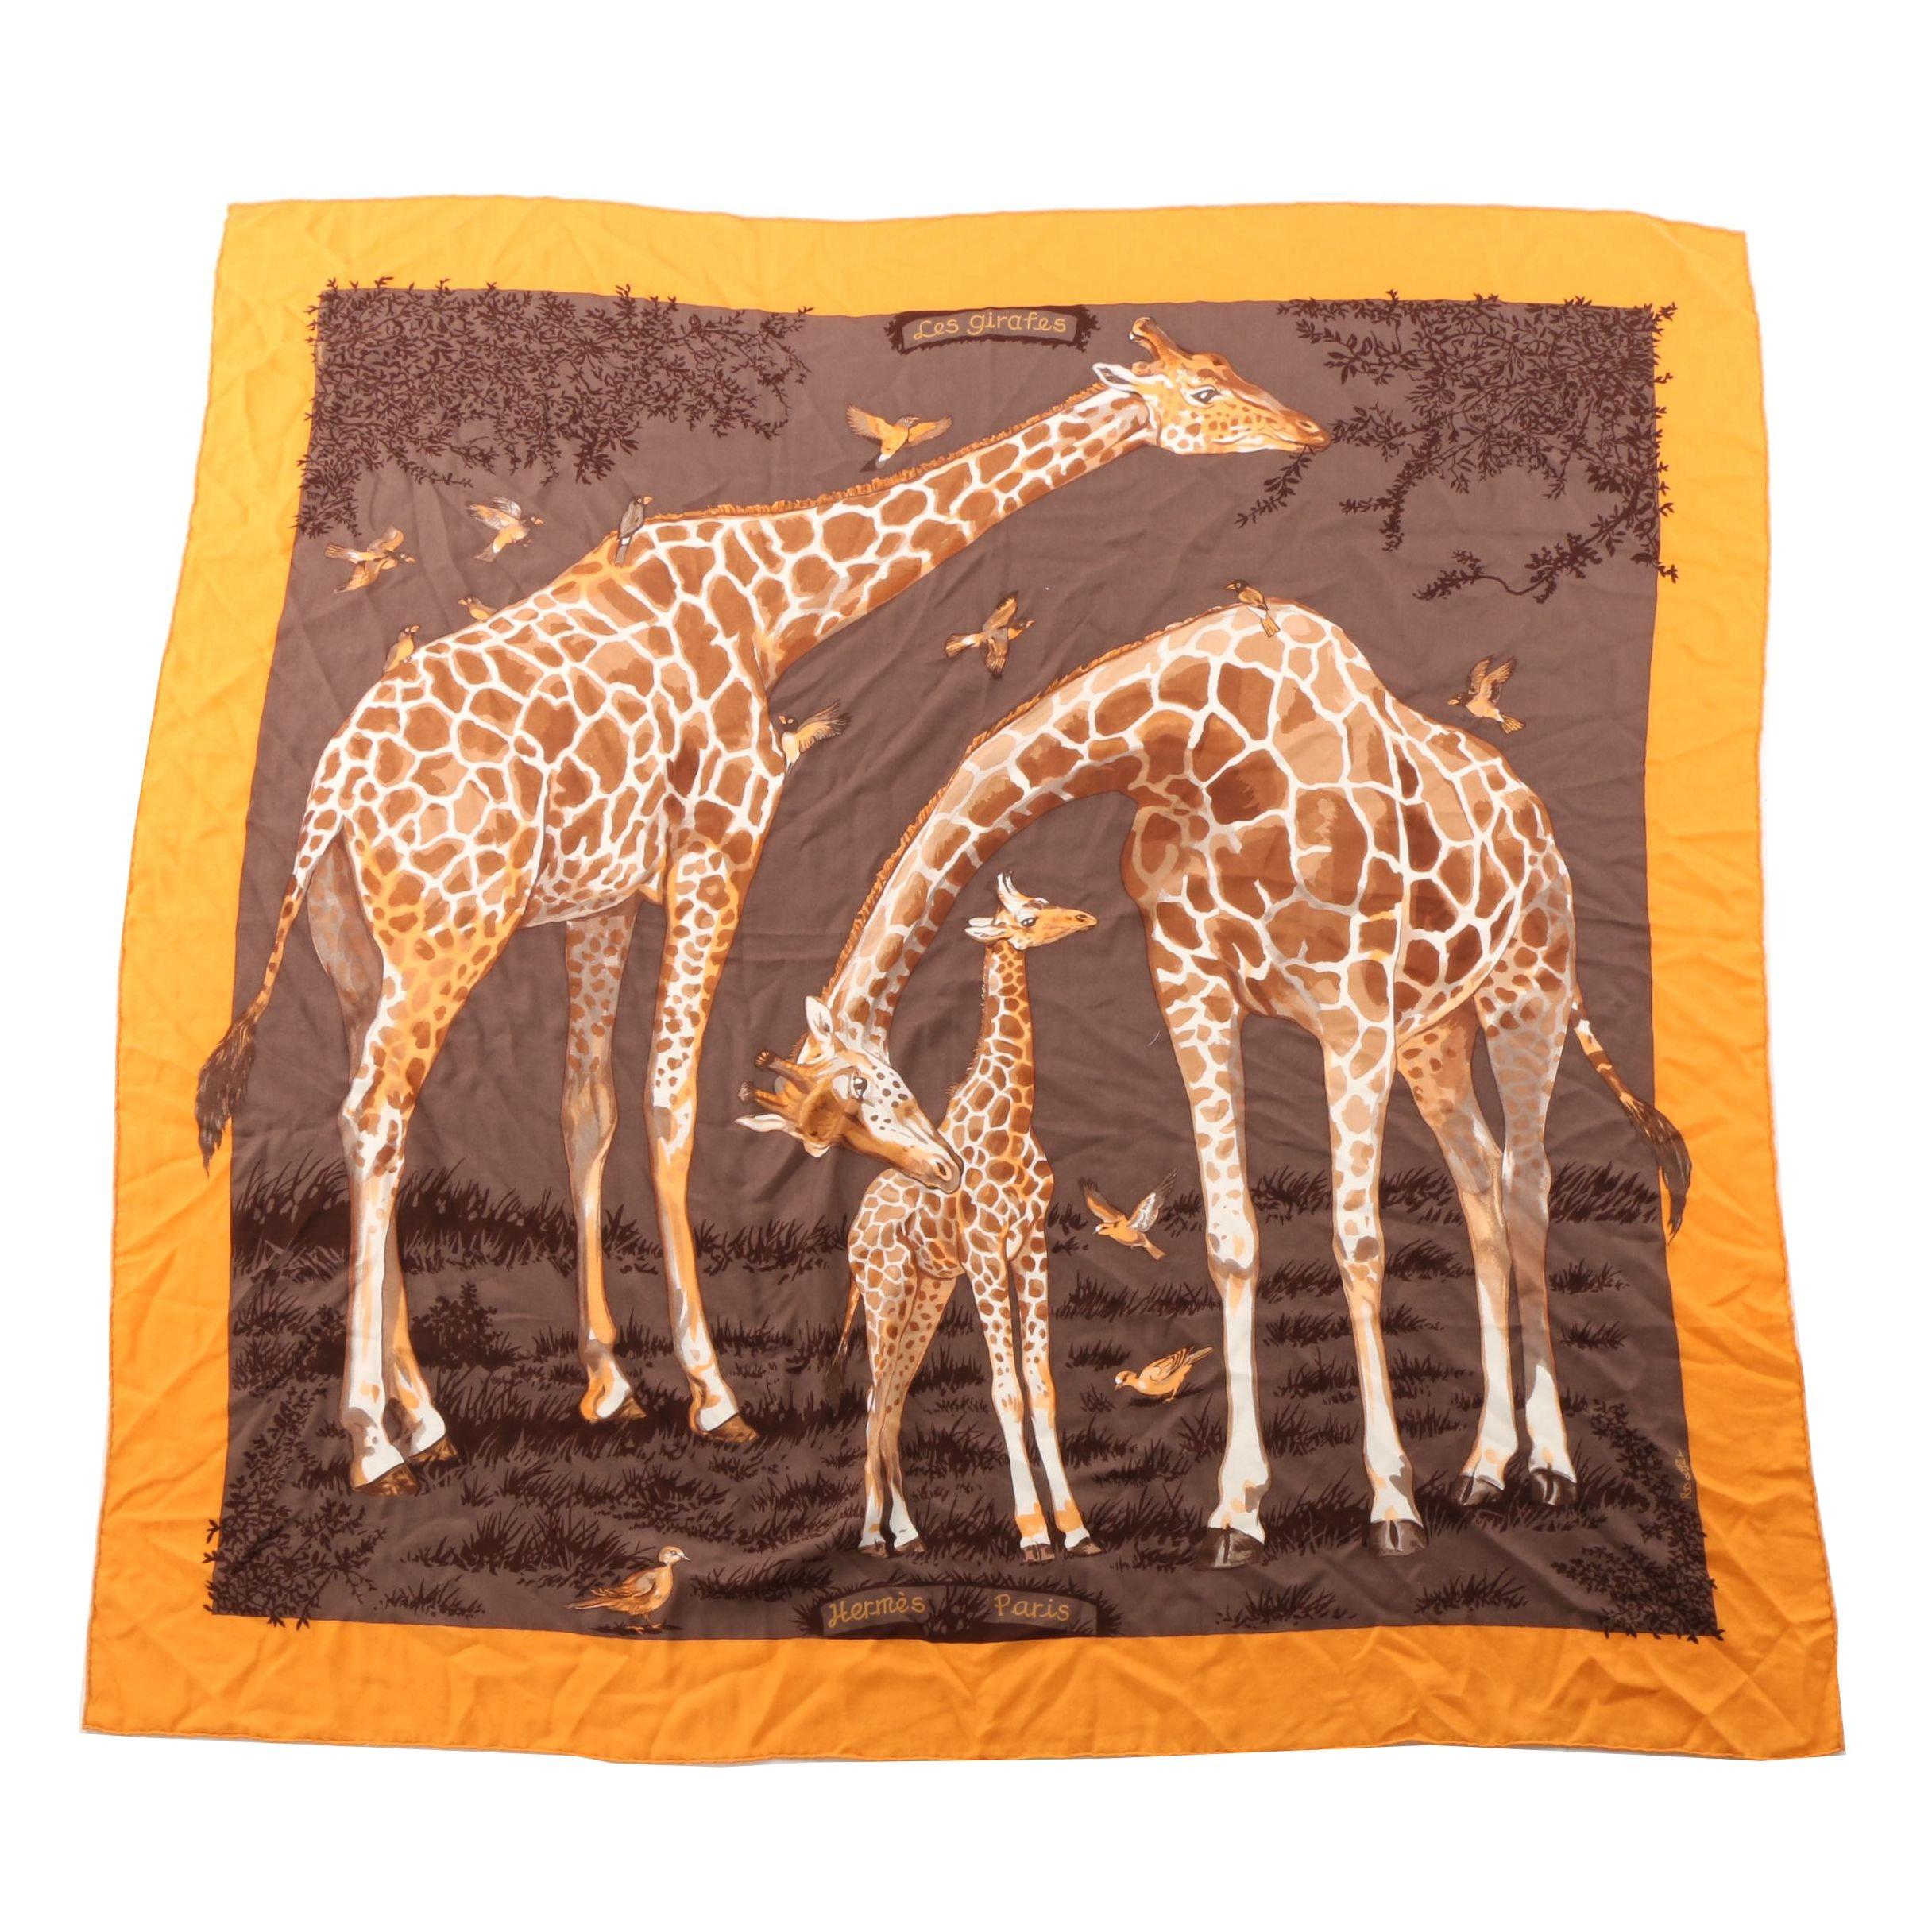 "Hermès of Paris ""Les Girafes"" Cashmere and Silk Twill Scarf"